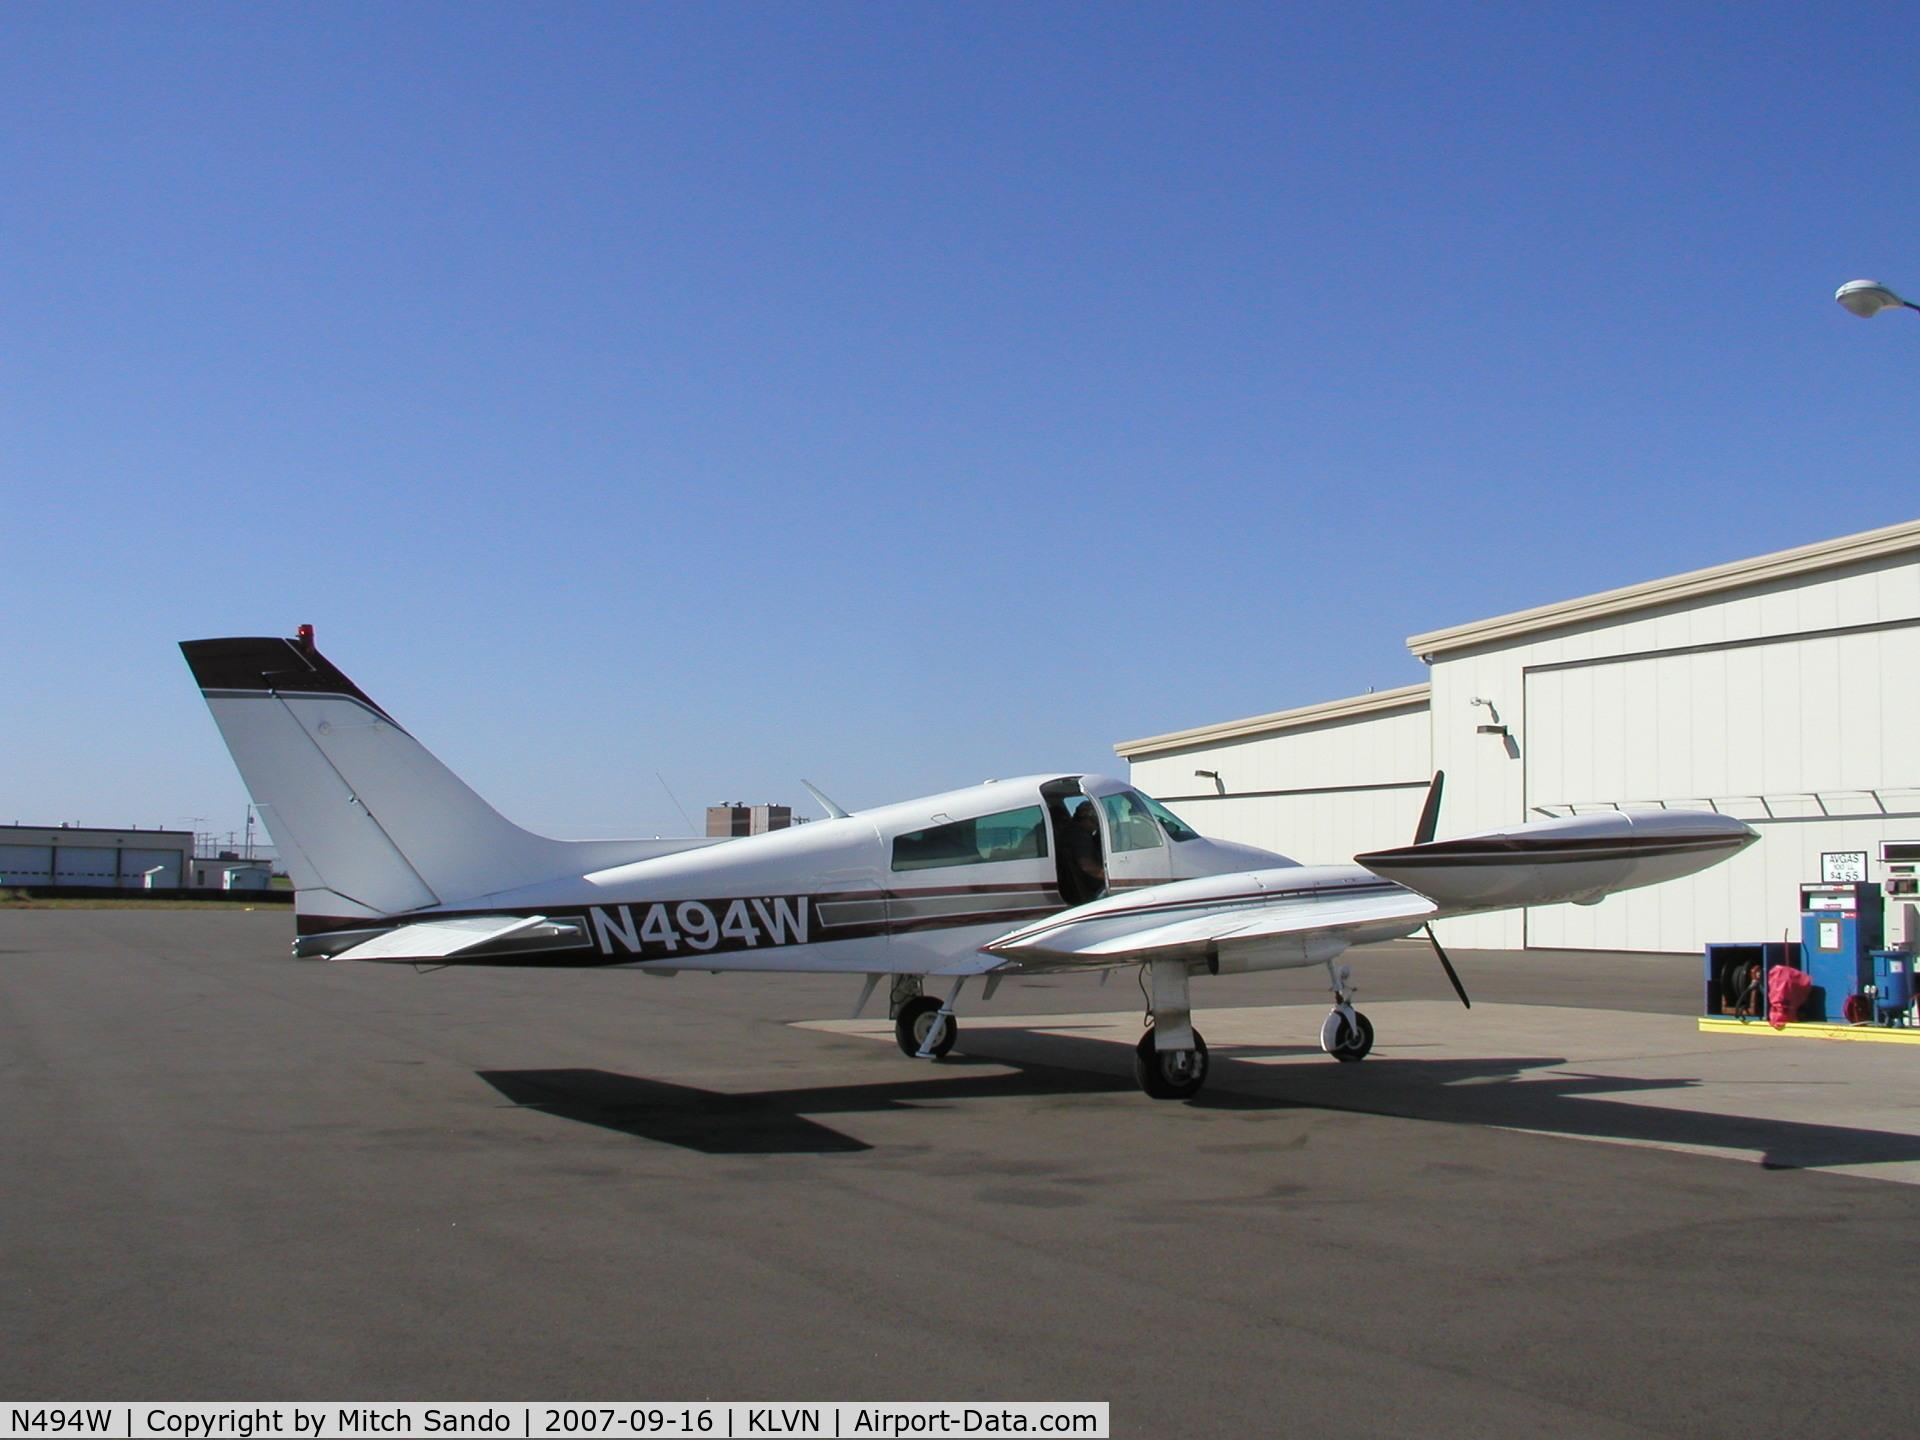 N494W, 1966 Cessna 310K C/N 310K0103, Parked at the fuel pumps at Airlake.